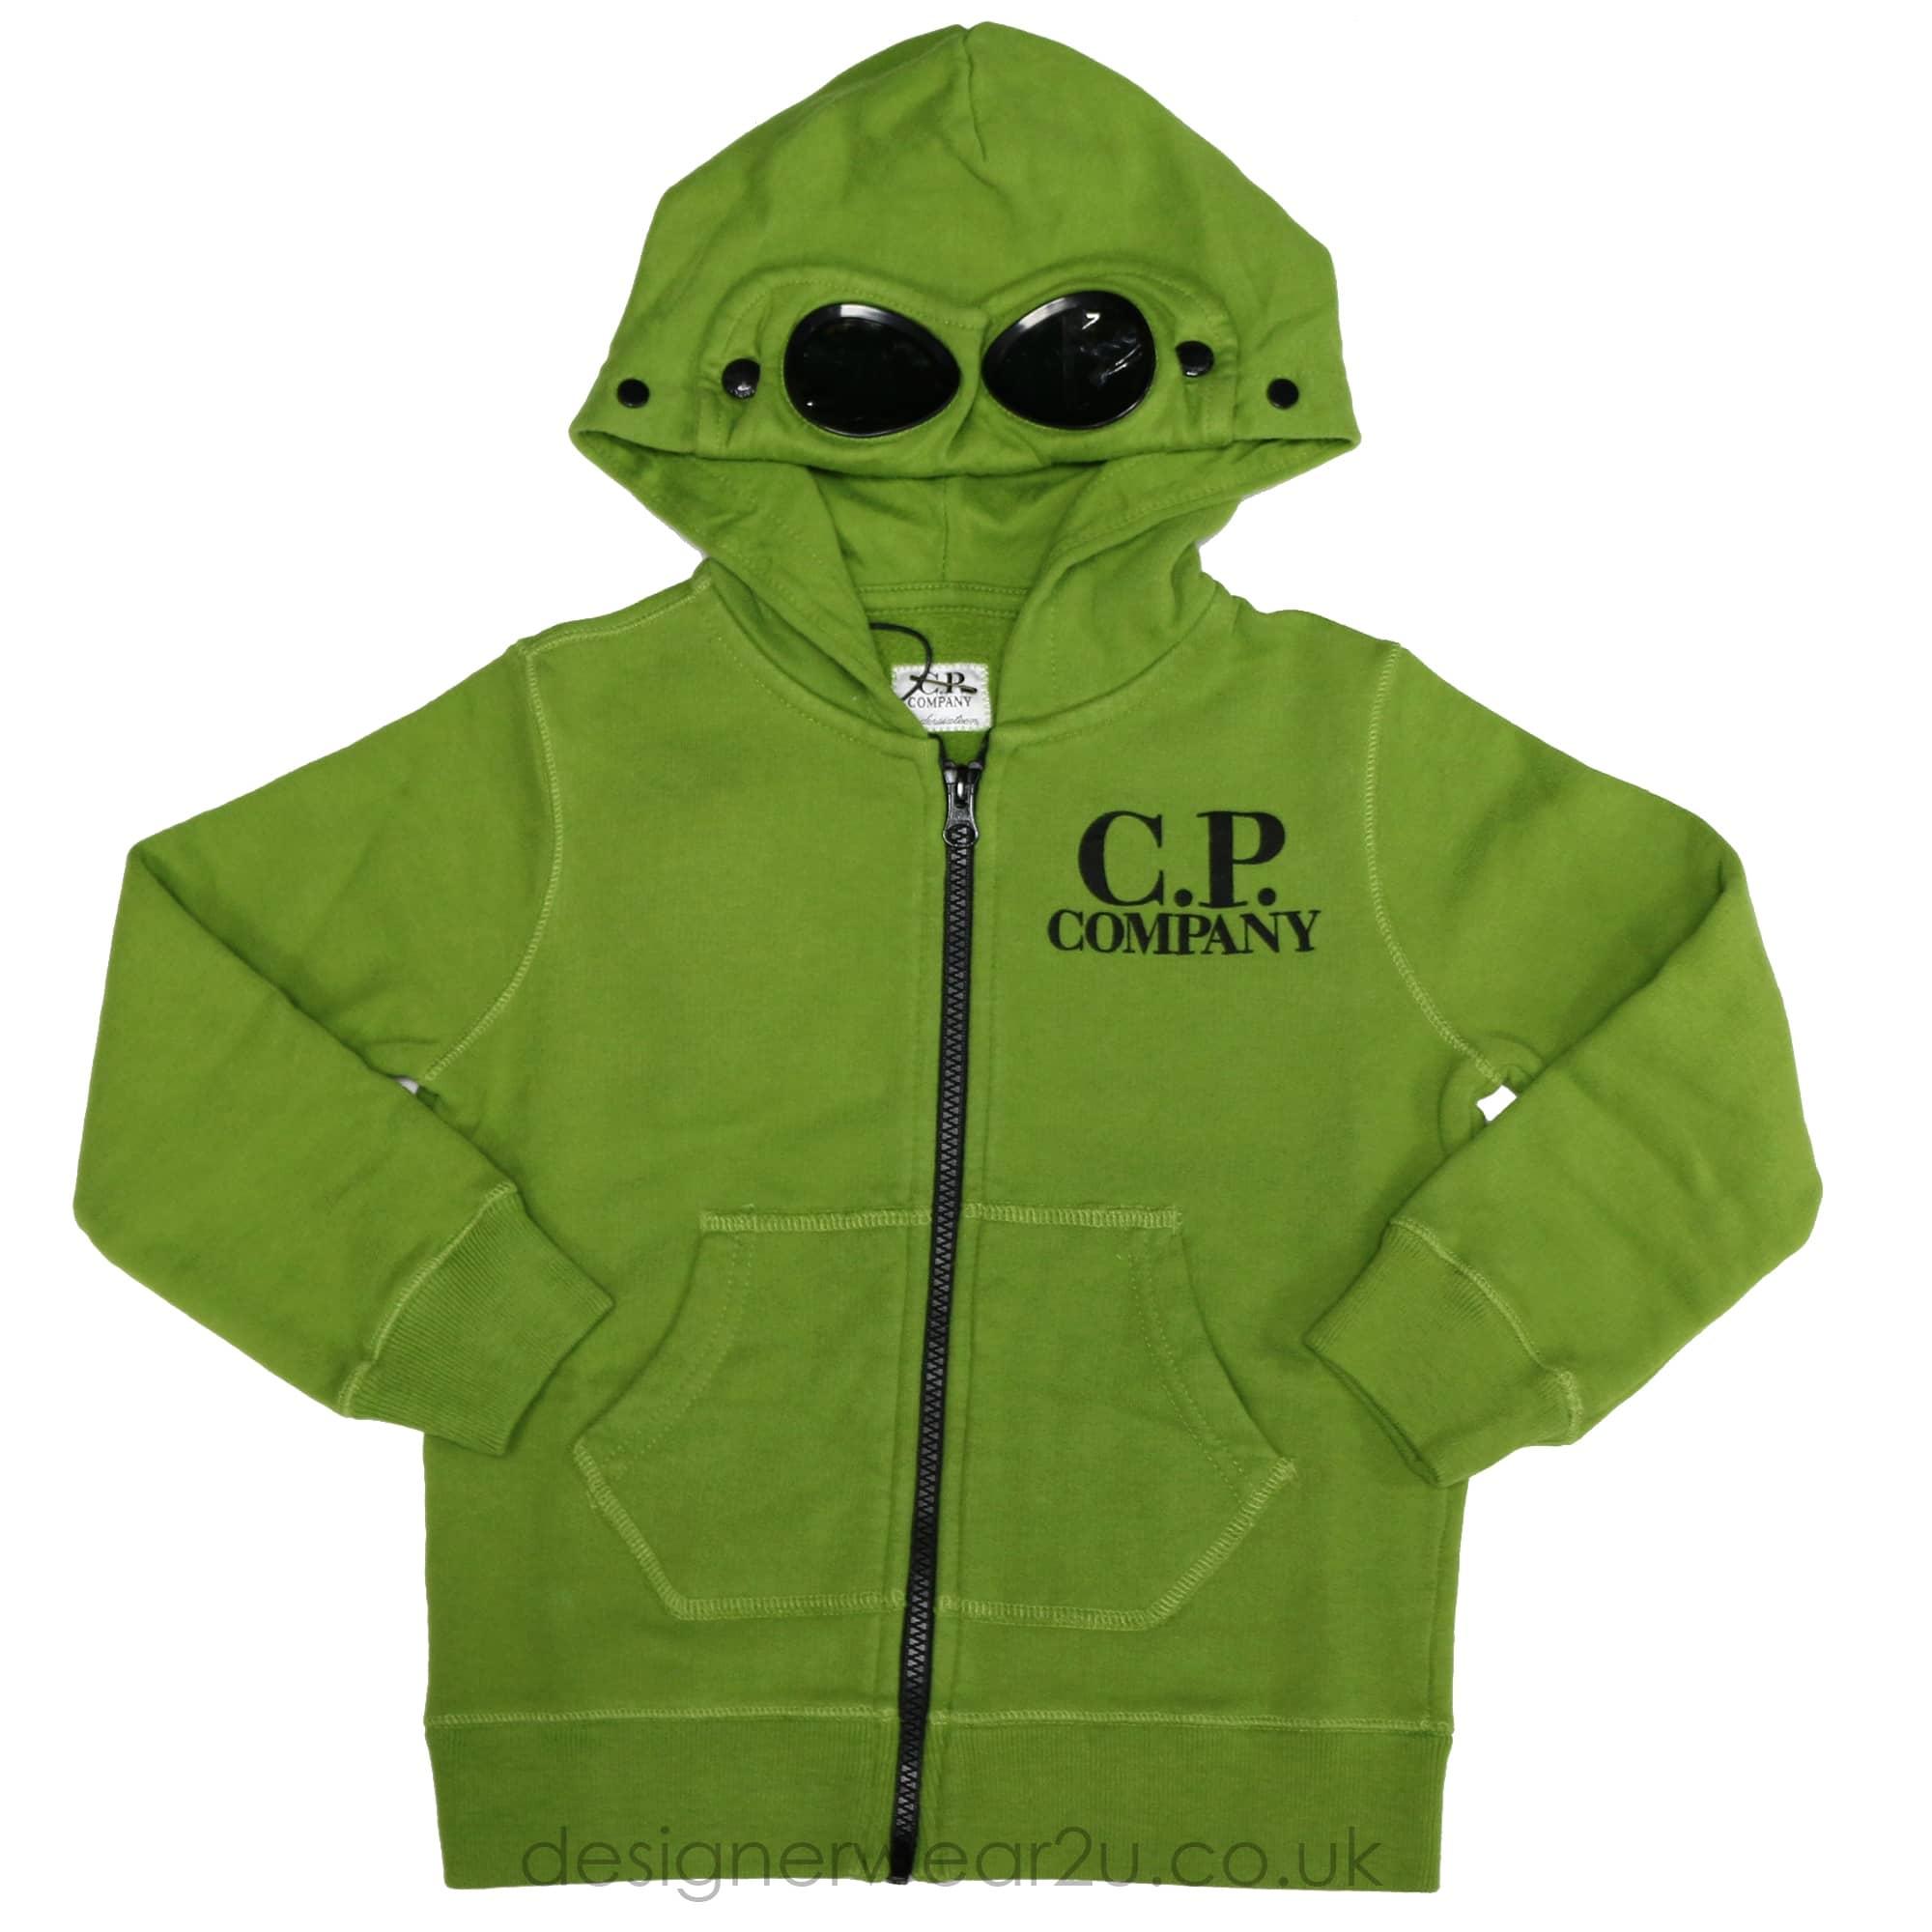 CP Company Undersixteen Kids CP Company Hooded Sweatshirt in Green